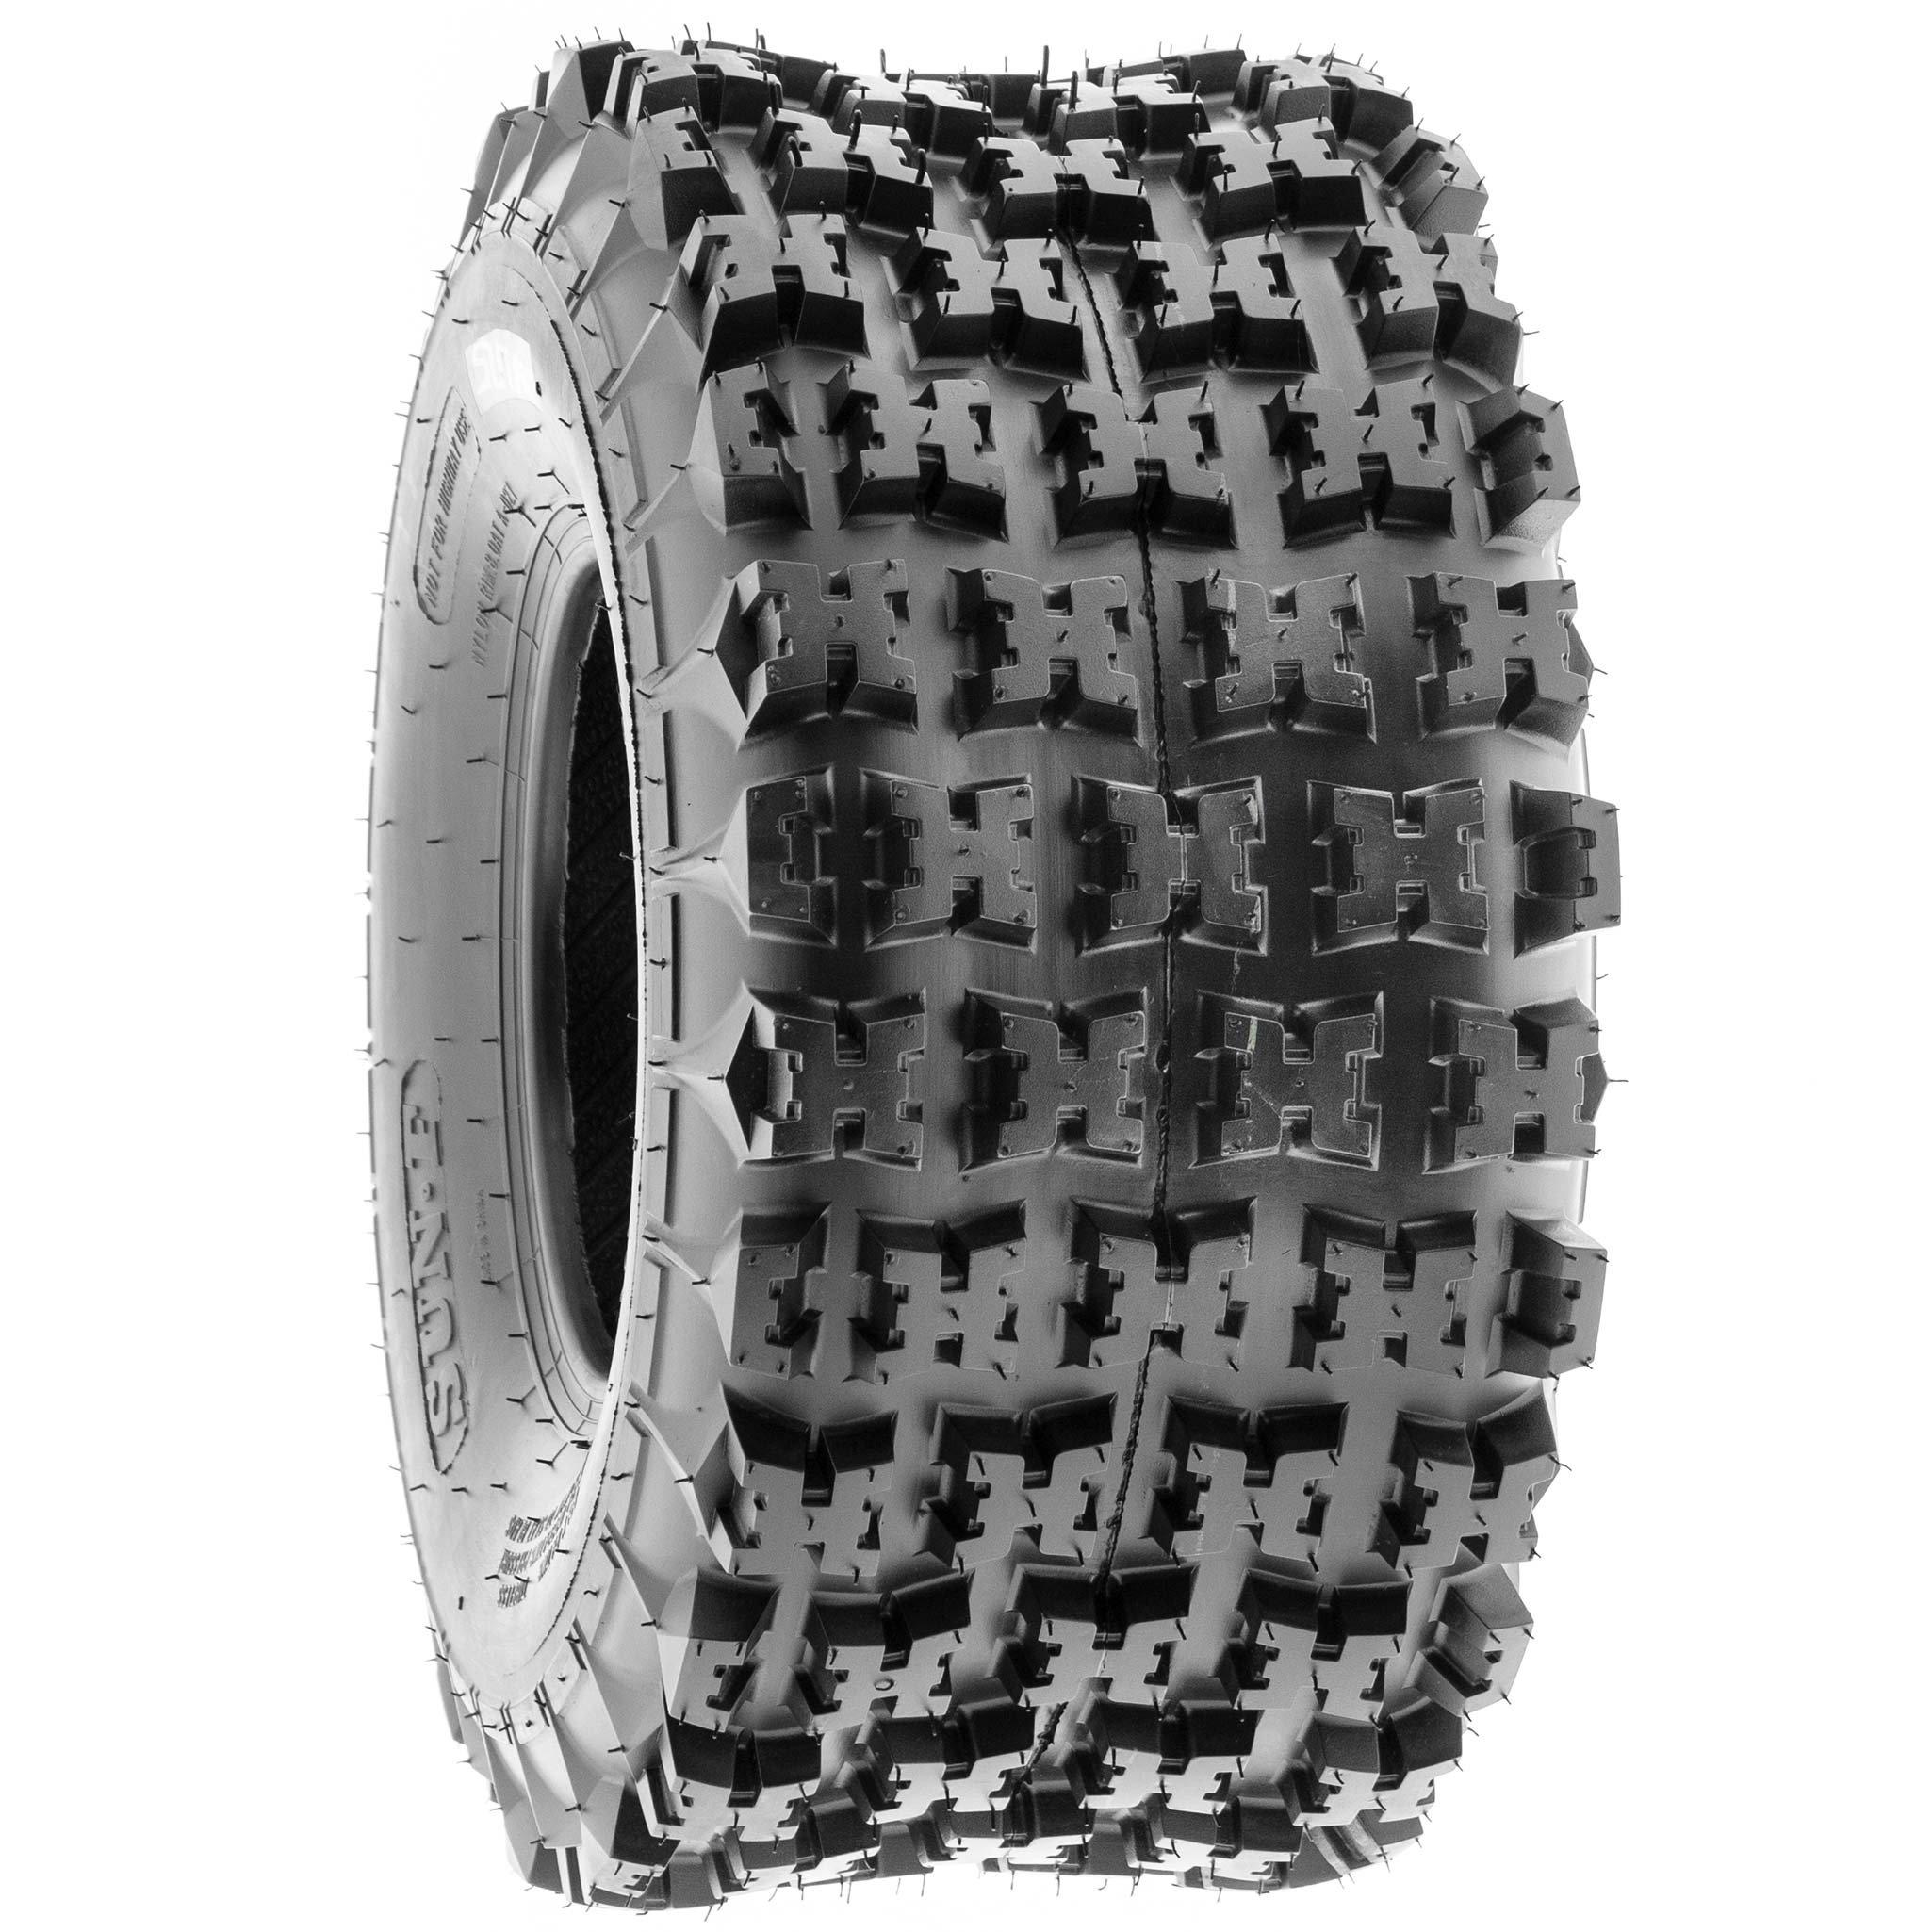 SunF 18x10.5-8 18x10.5x8 ATV UTV All Terrain Race Replacement 6 PR Tubeless Tires A027, [Set of 2] by SunF (Image #6)